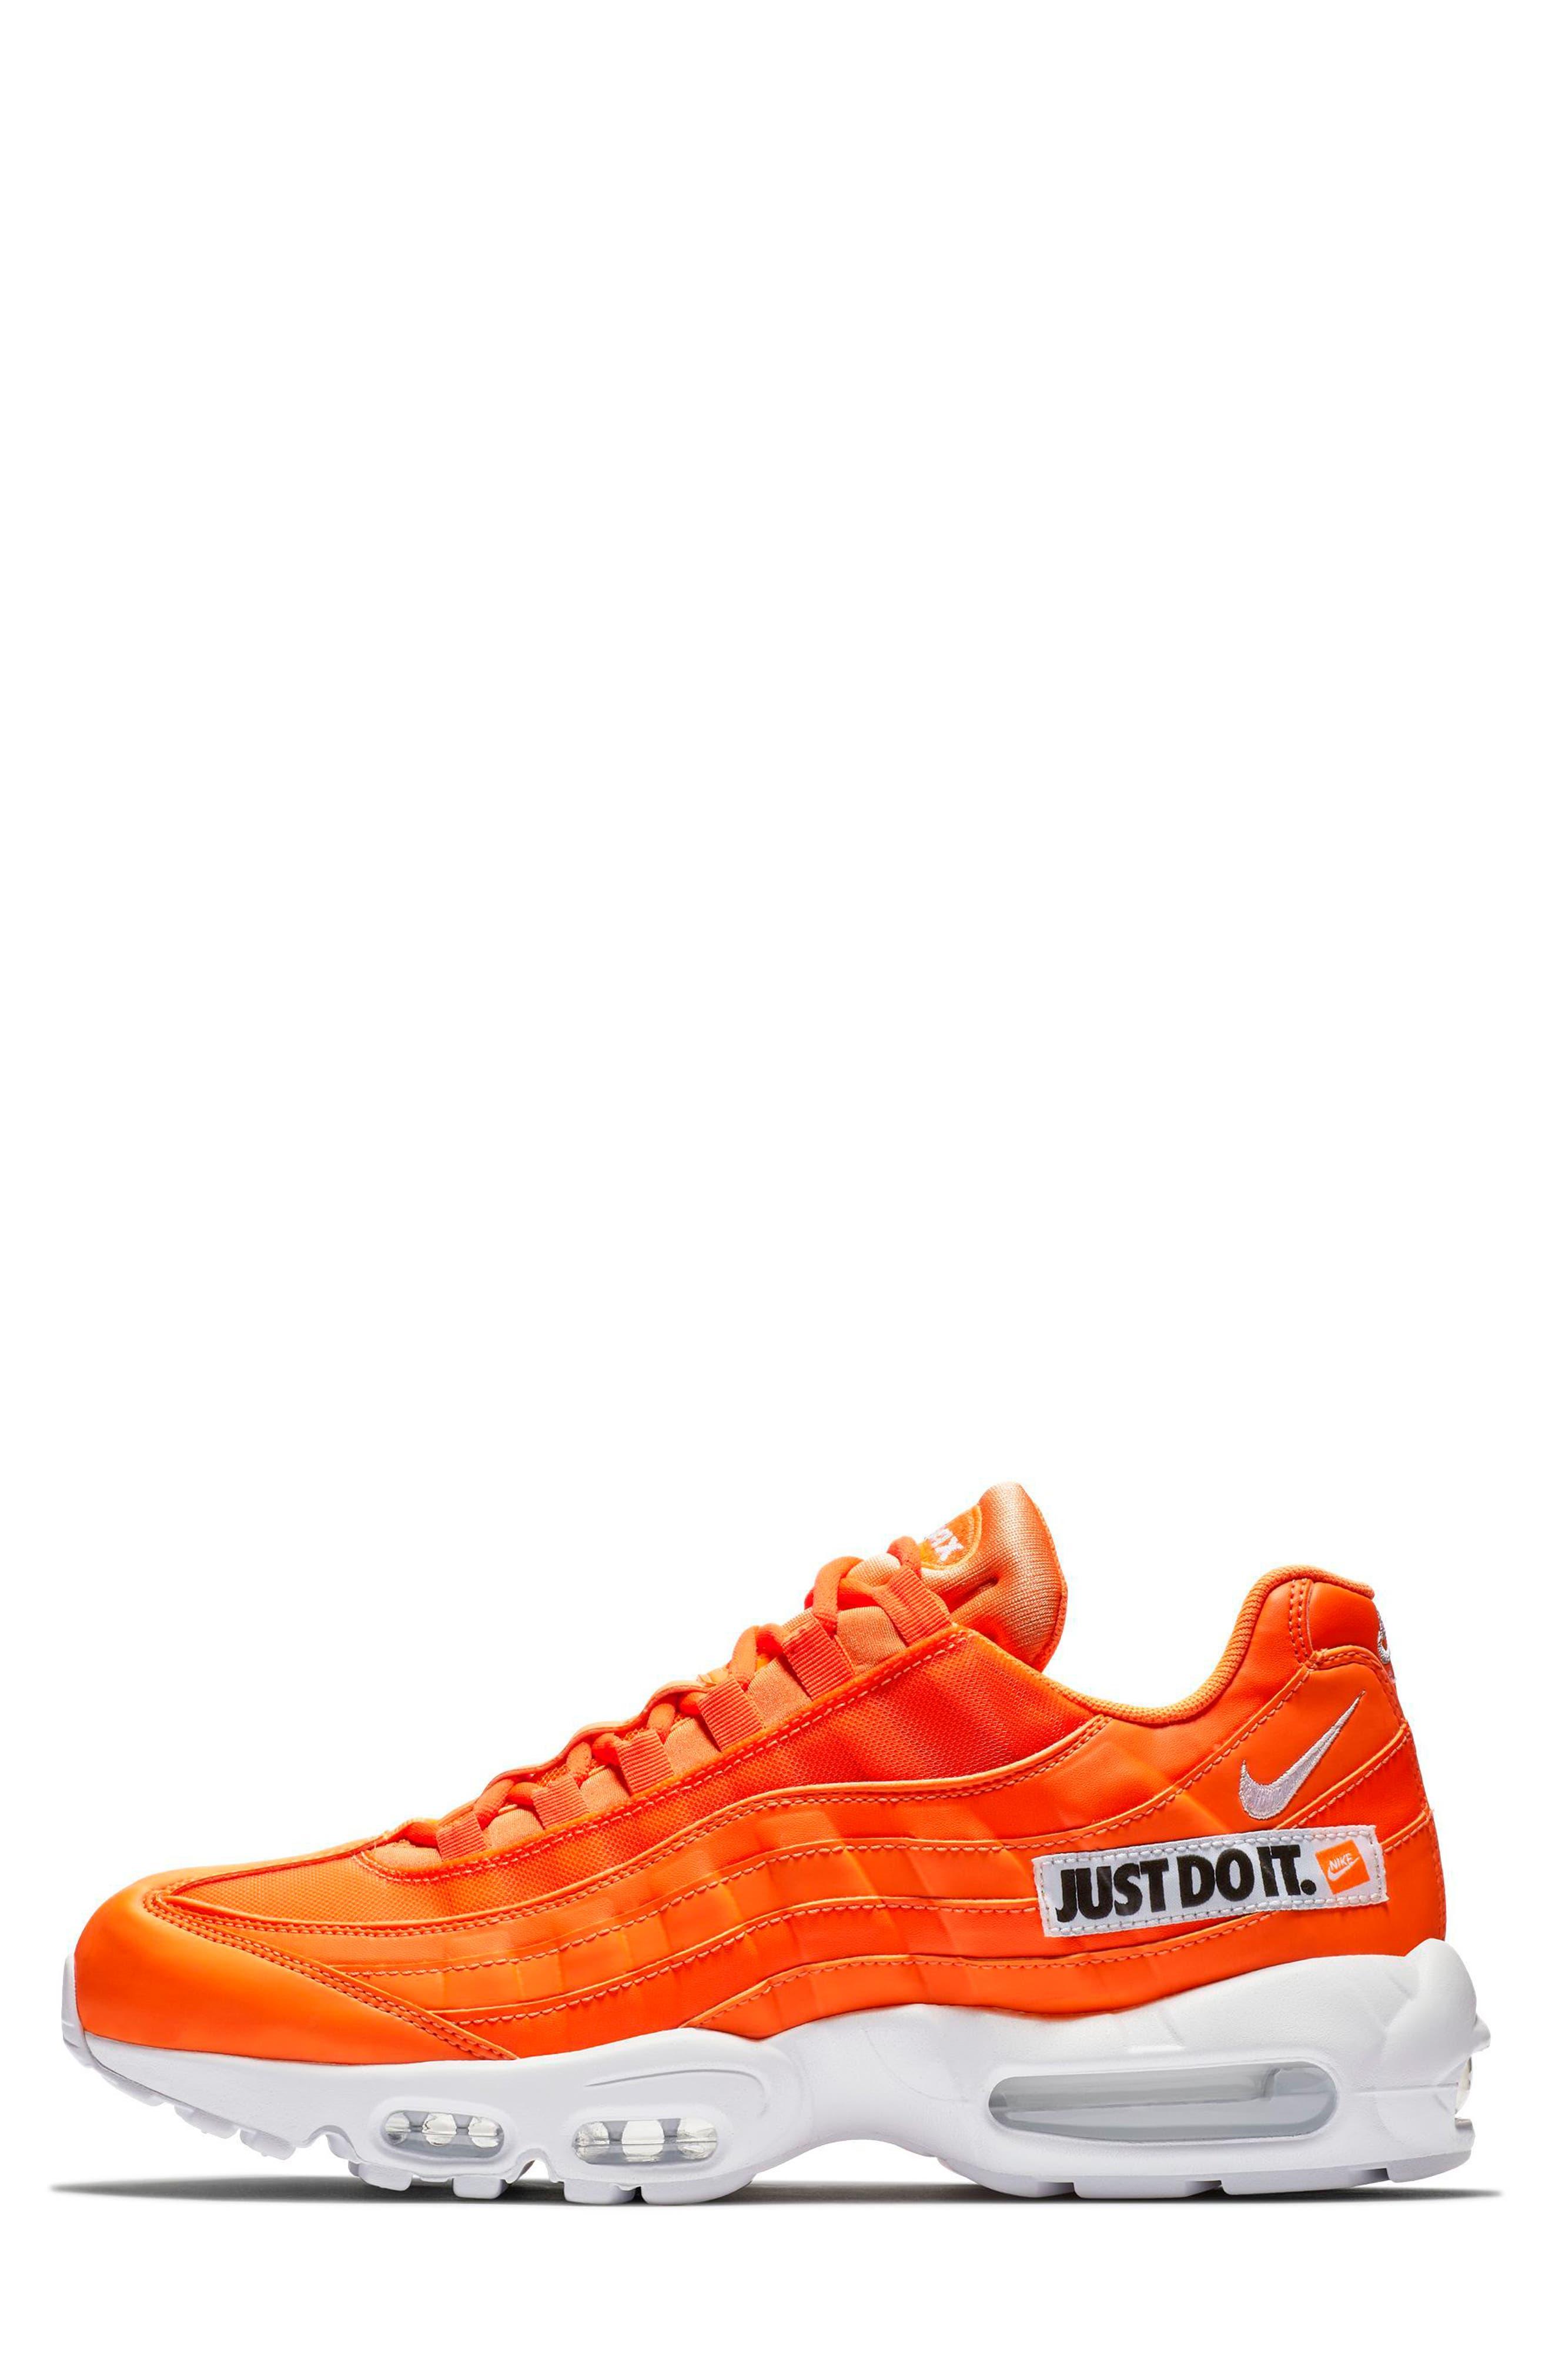 Air Max 95 SE Running Shoe,                             Alternate thumbnail 7, color,                             ORANGE/ WHT-BLK